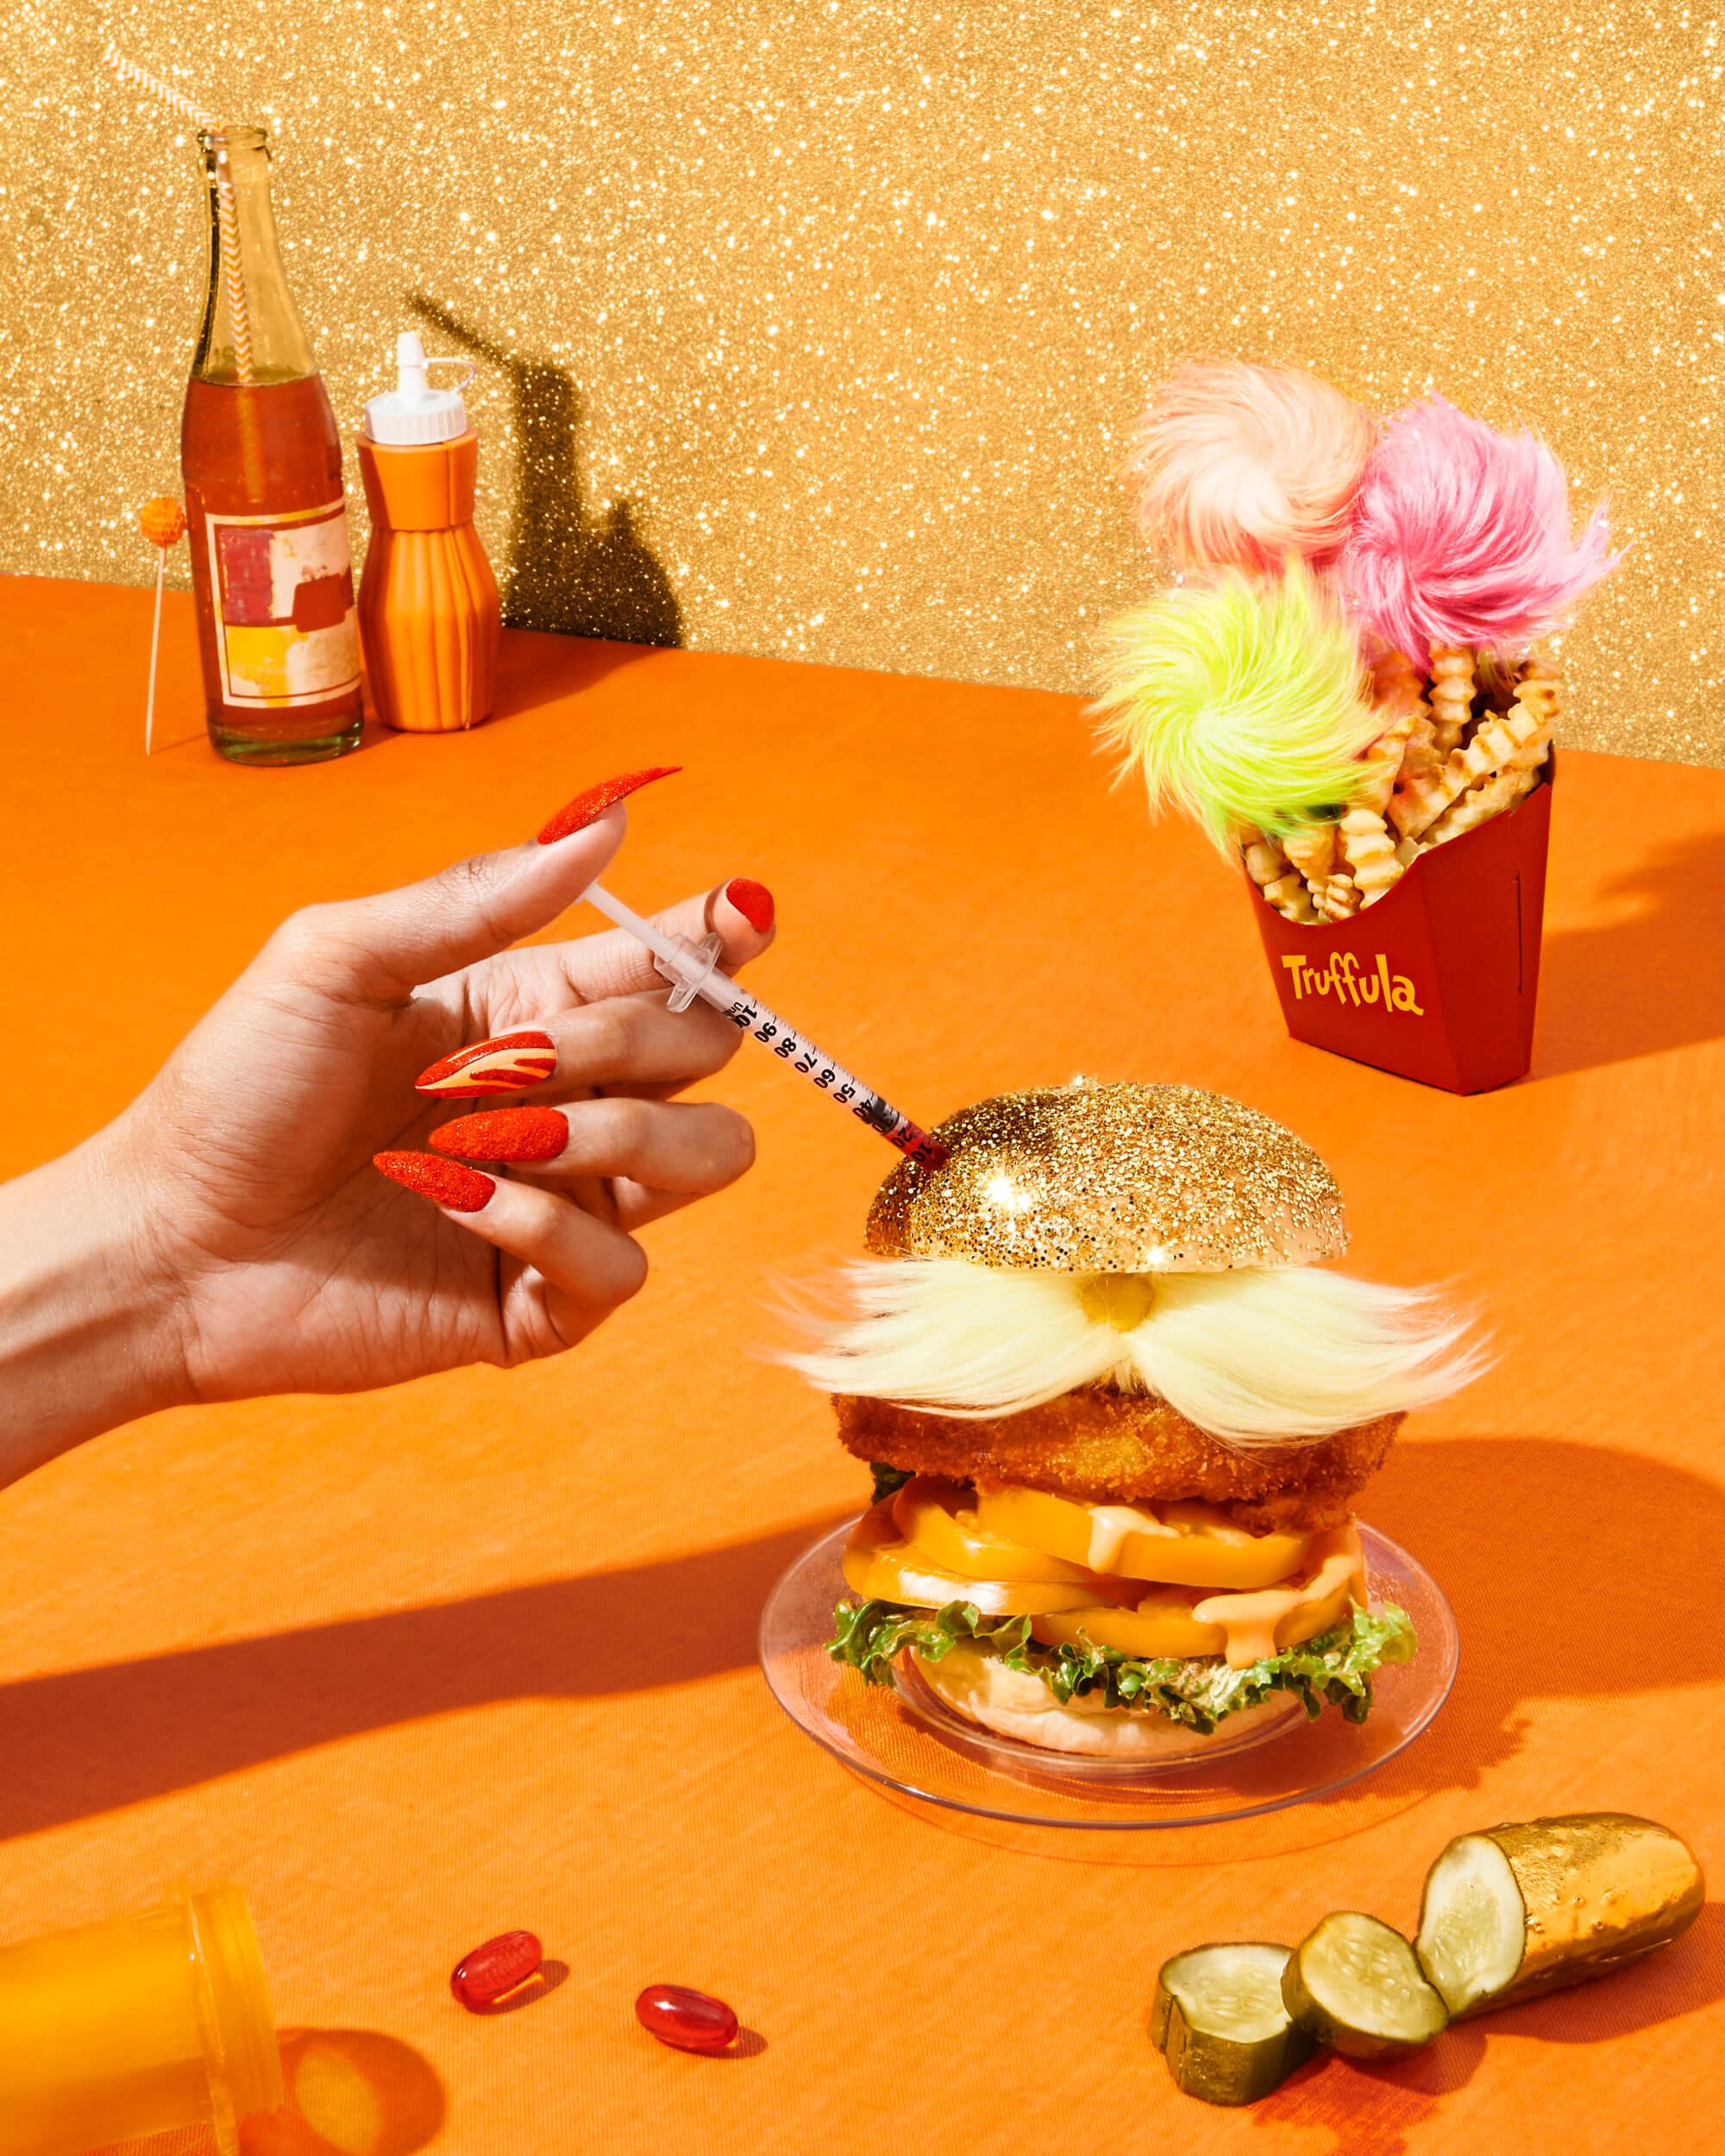 "credits: photo- jenna gang, creative direction- edward yeung, prop styling- anna lemi, food styling- ali nardi, manicure- ada yeung, model- idriss bozhilov  description: onceptual food photograph of ""Lorax Burger"" from Dr. Seuss."